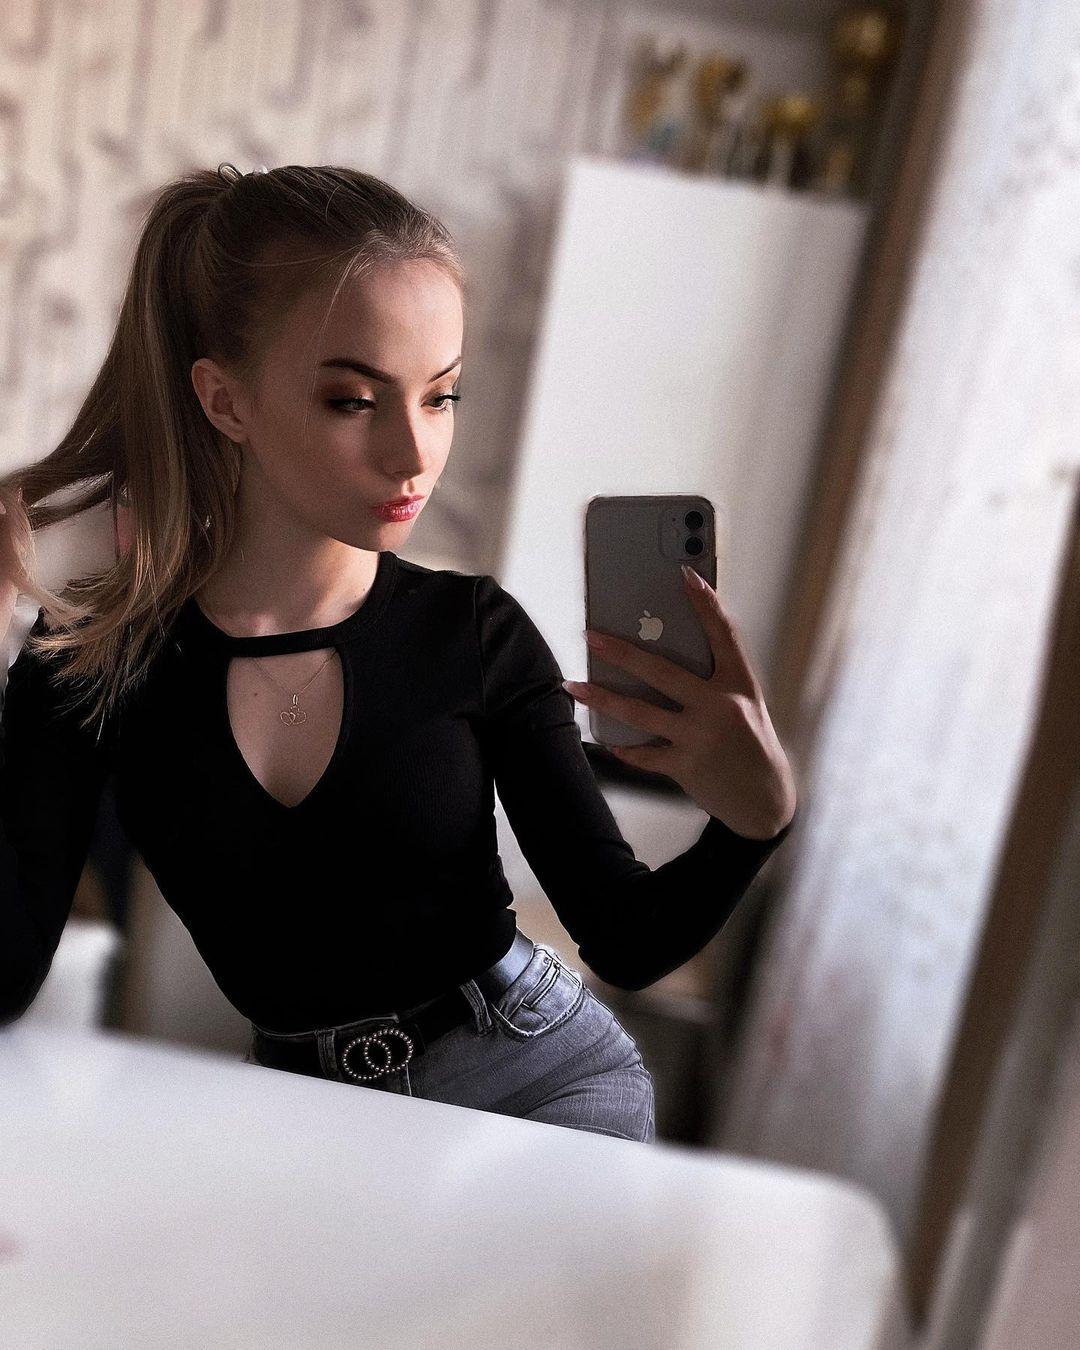 Anastasia-Fefilova-Wallpapers-Insta-Fit-Bio-16